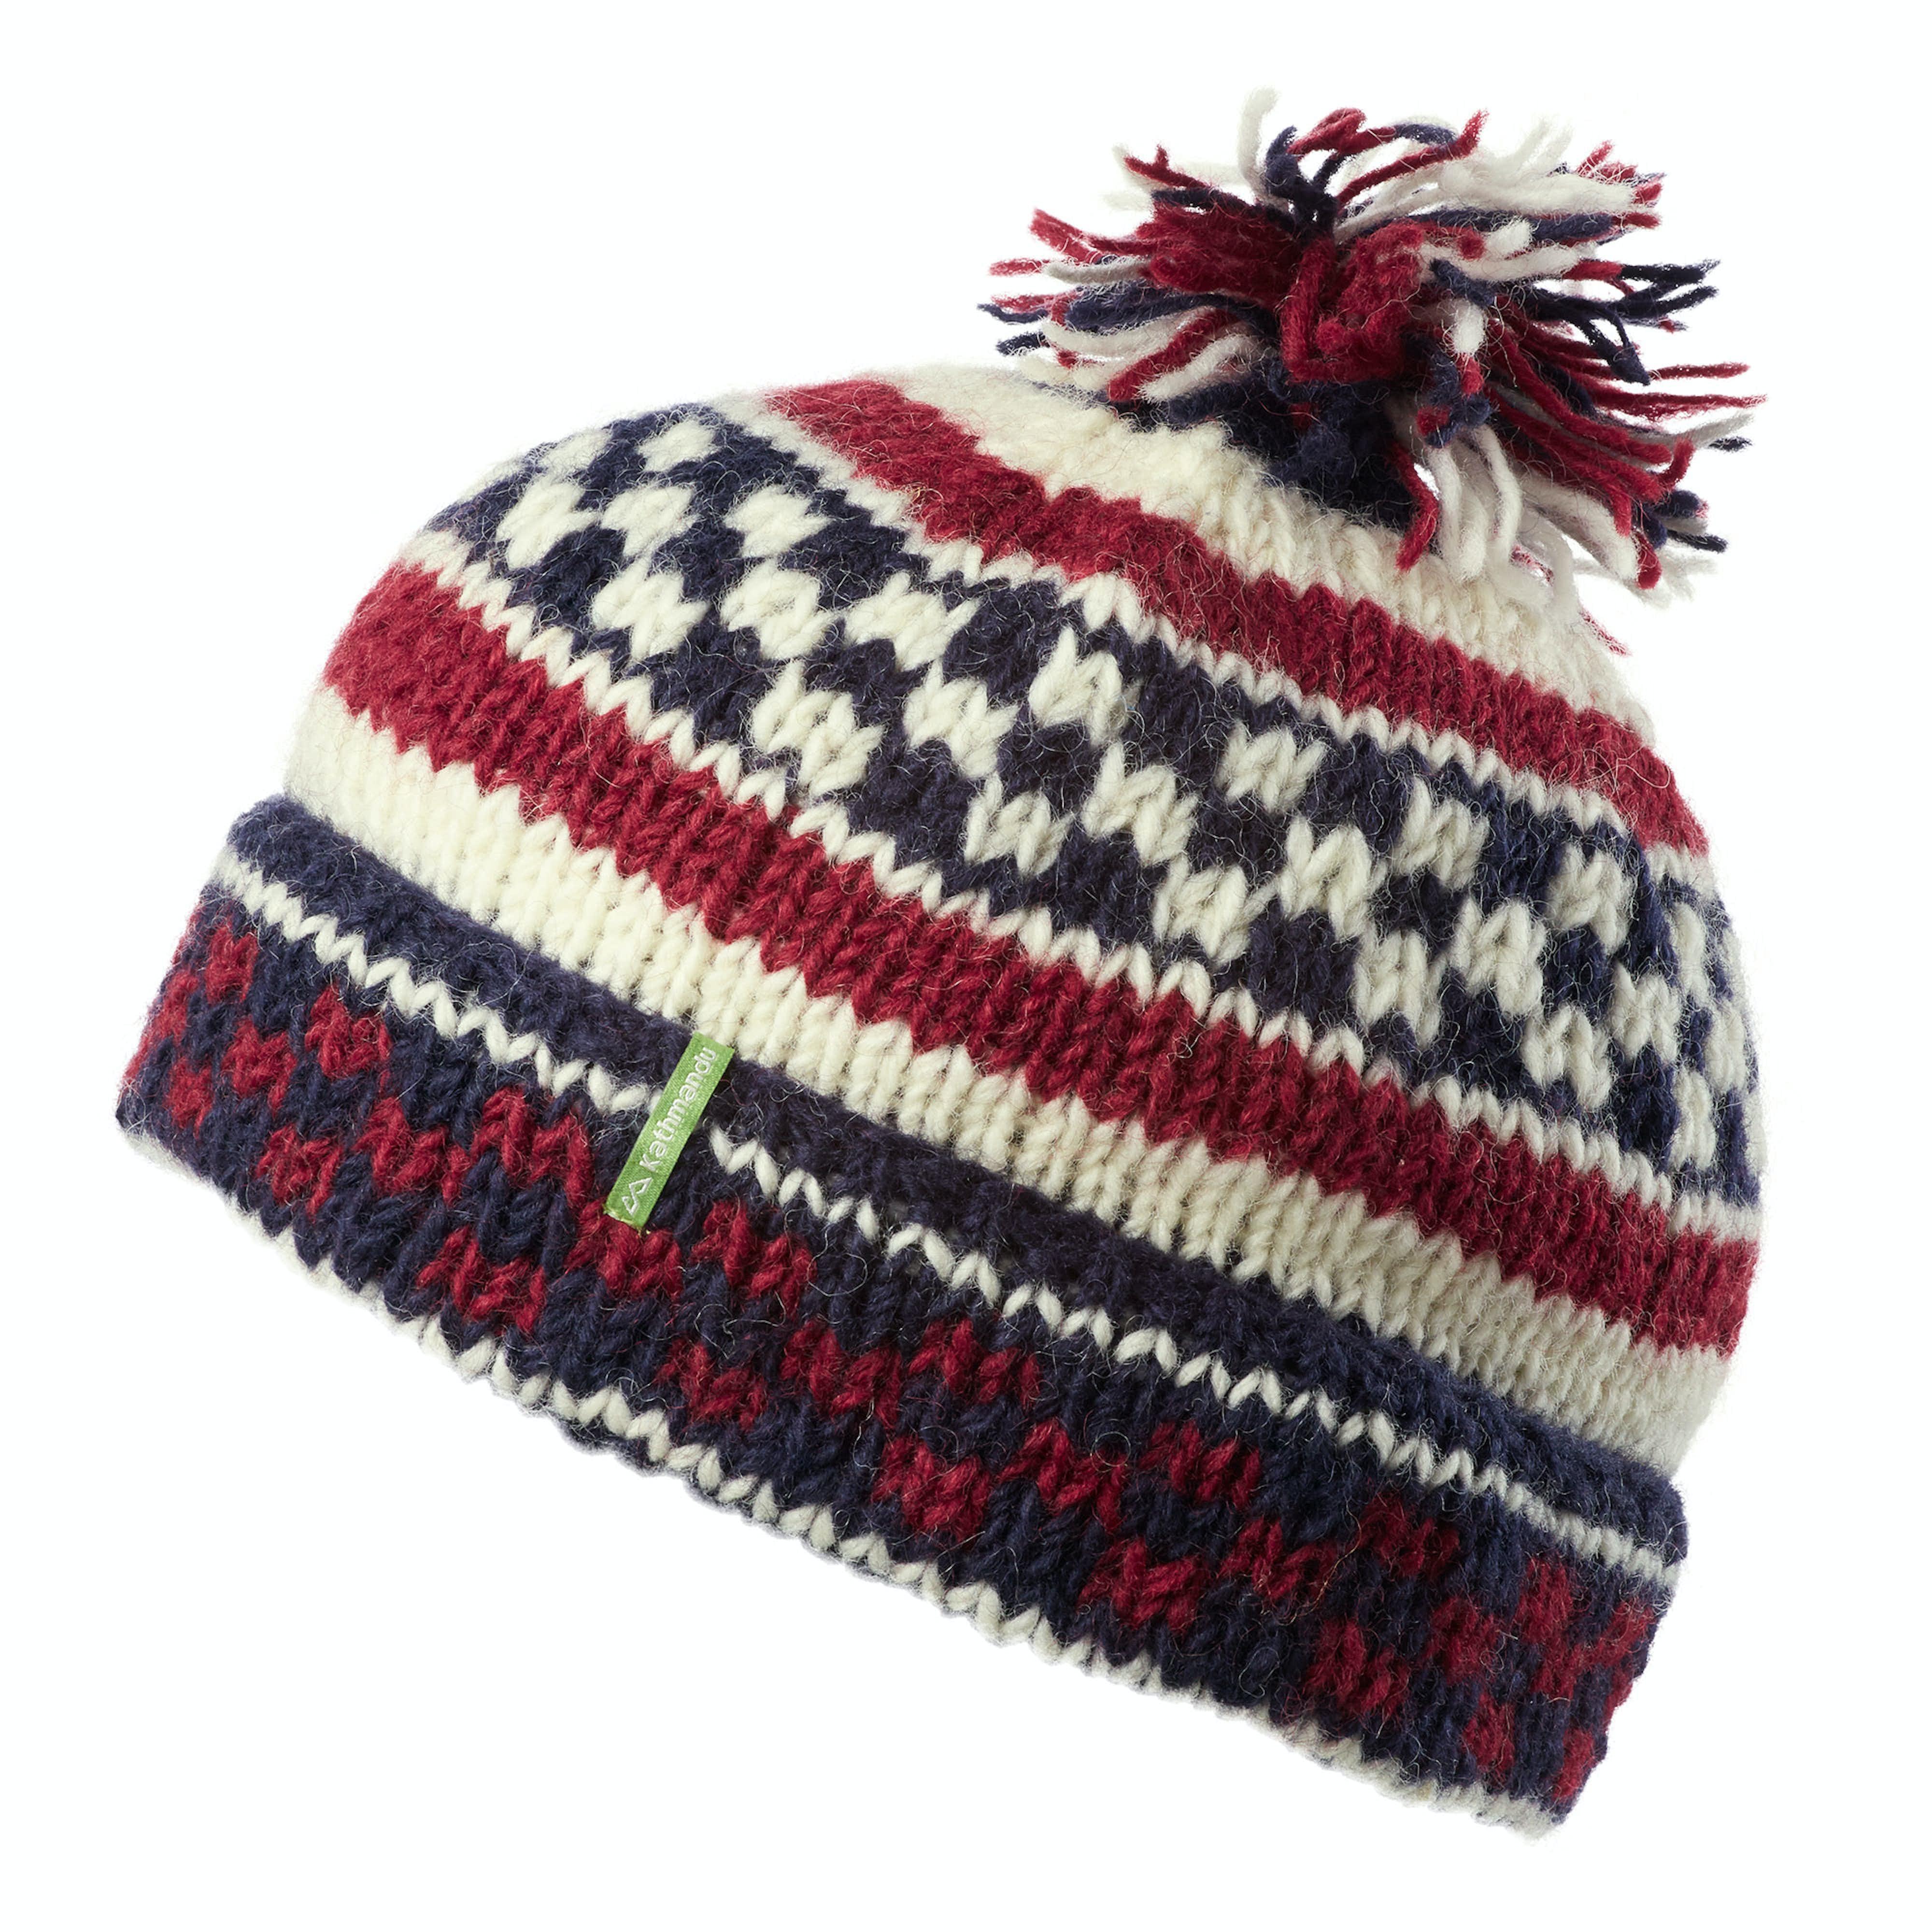 62782900 Hand Knitted Khusi Beanie Hand Knitted Khusi Beanie